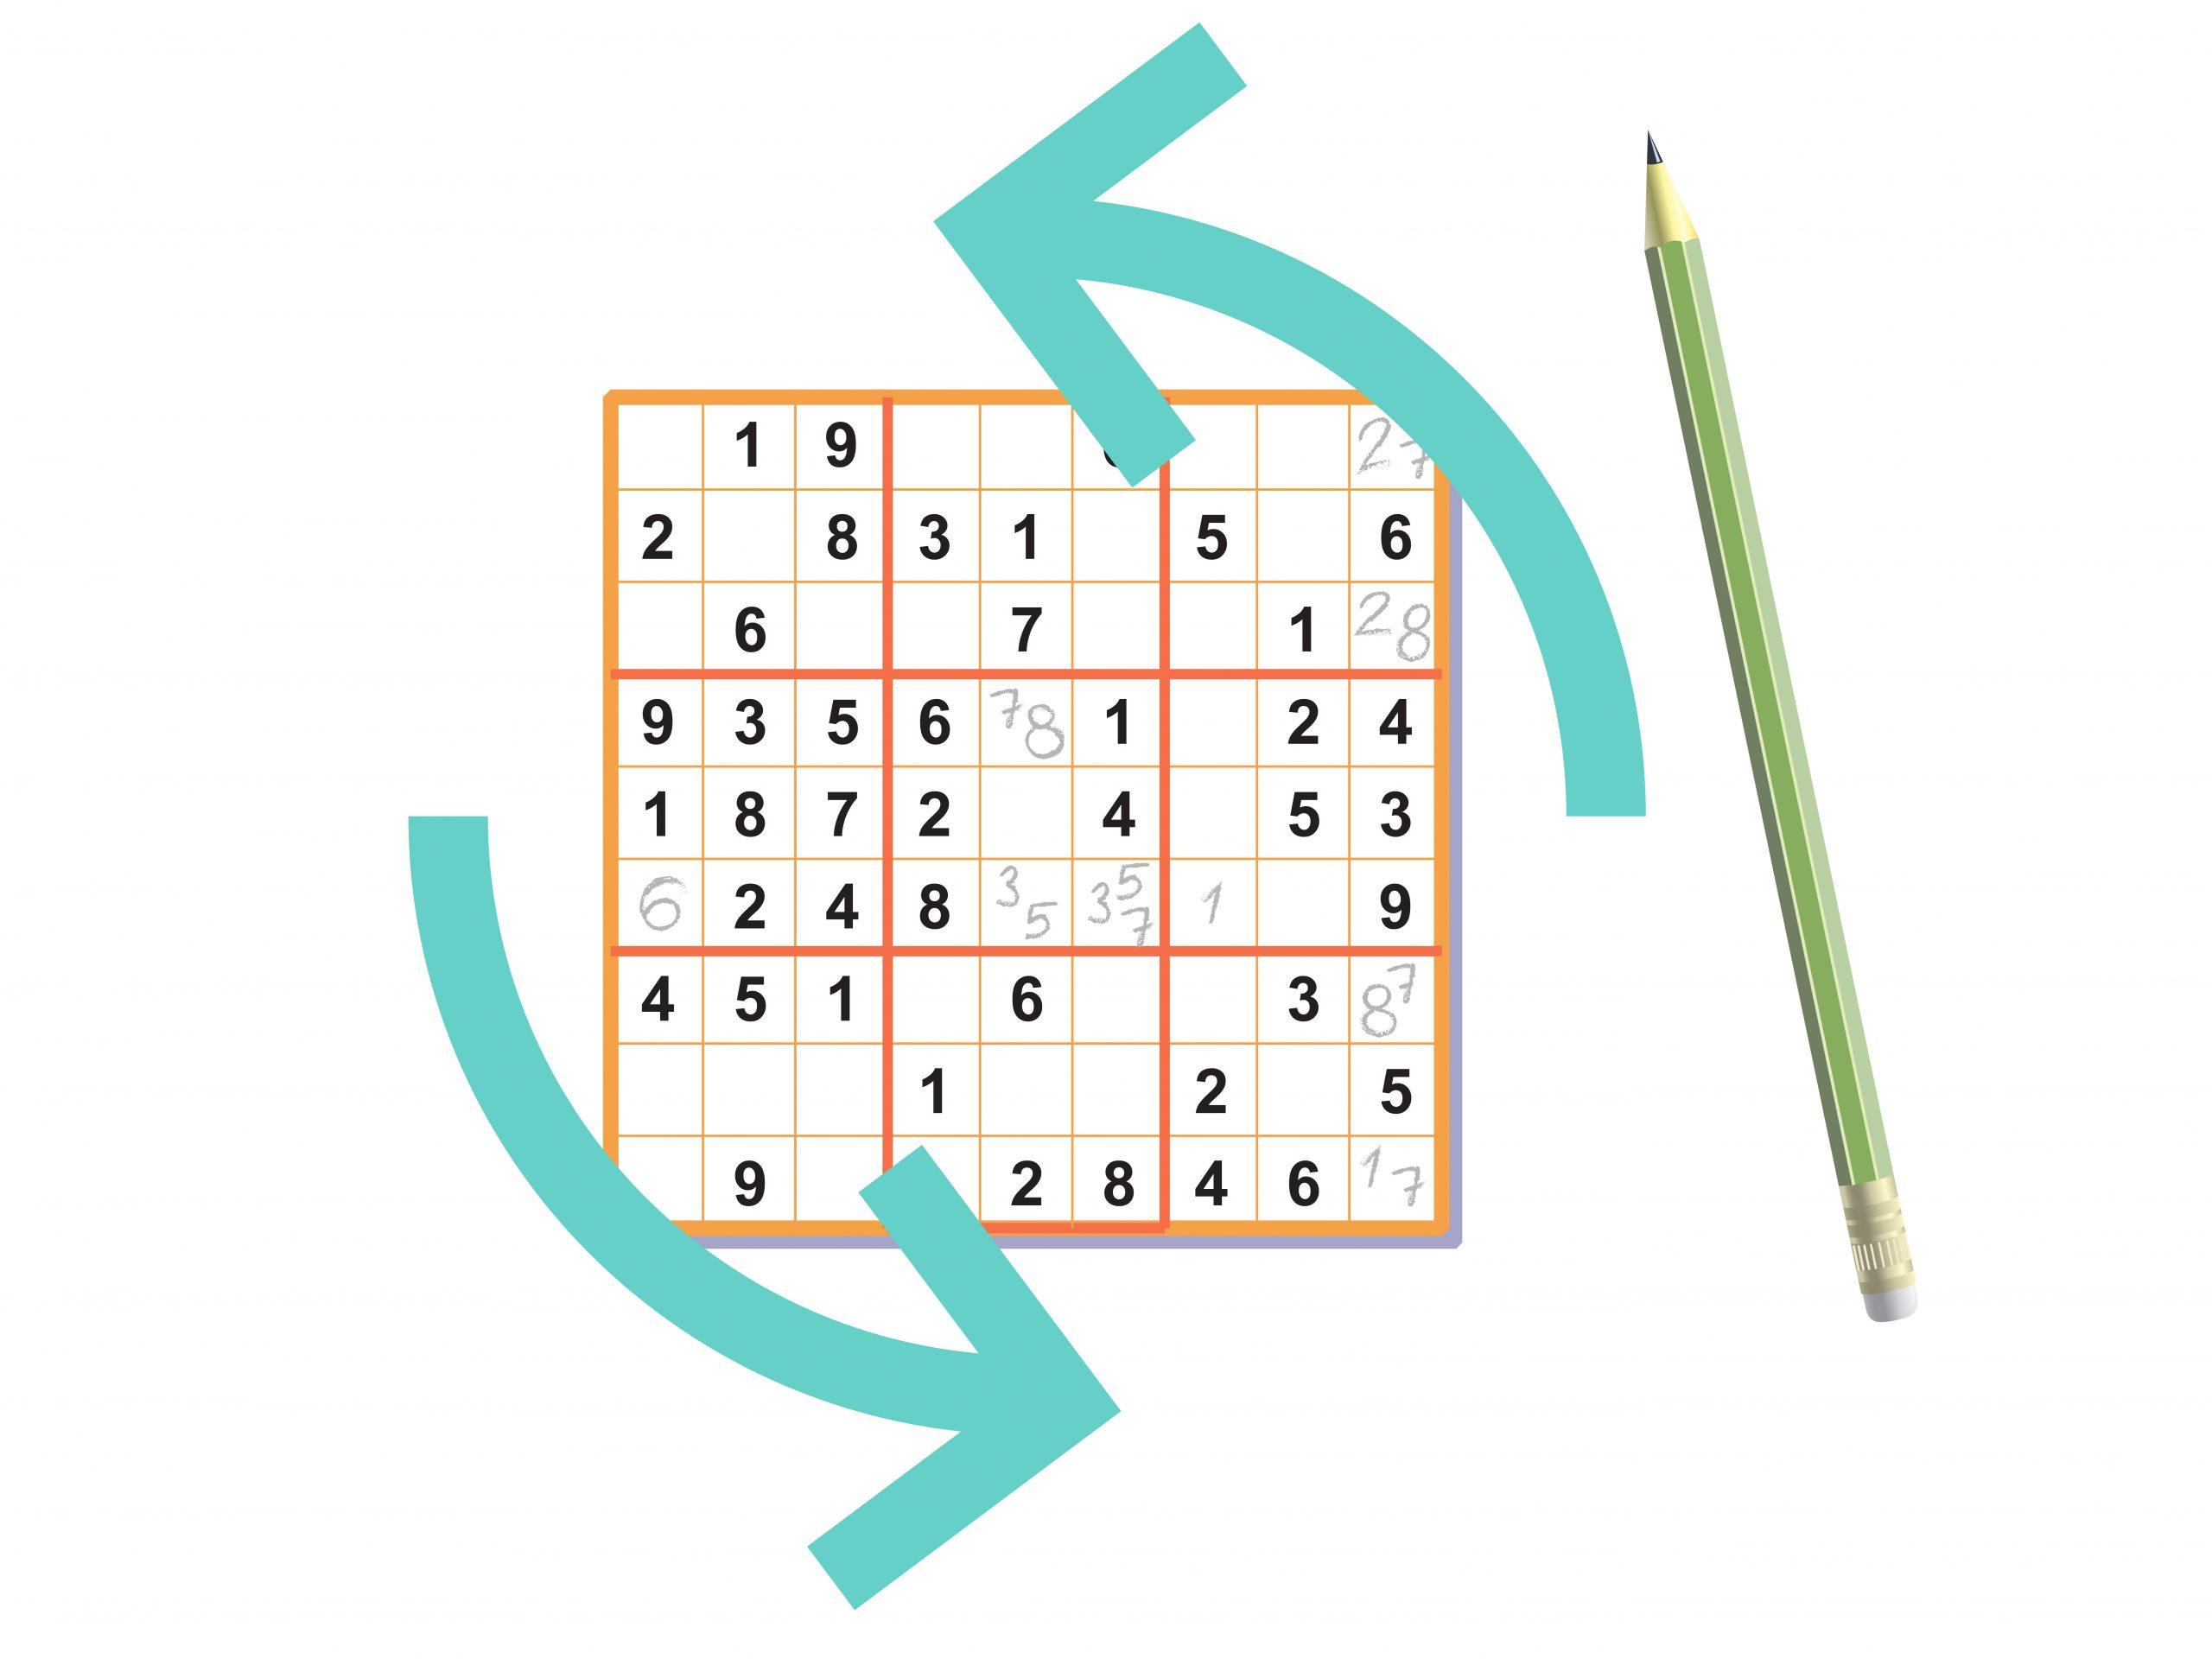 3 Manières De Réussir Un Sudoku - Wikihow serapportantà Sudoku Gratuit En Ligne Facile